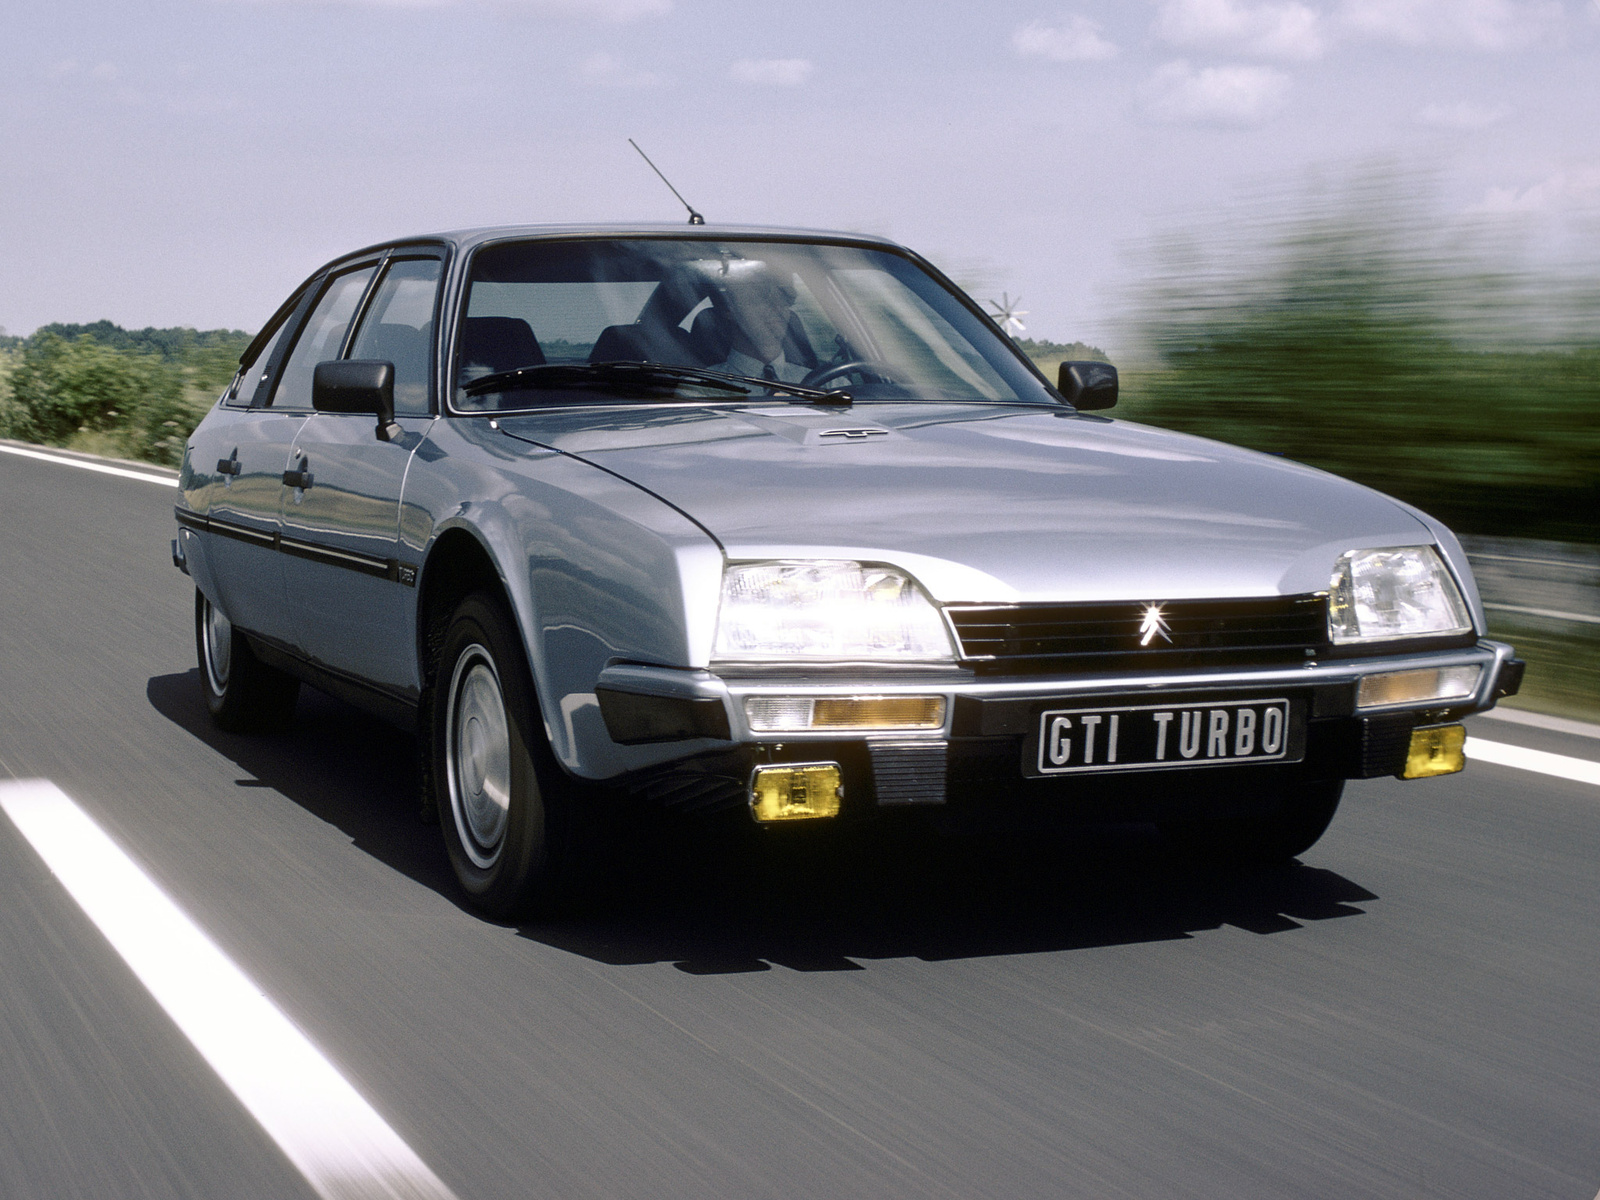 Citroen cx25 gti turbo